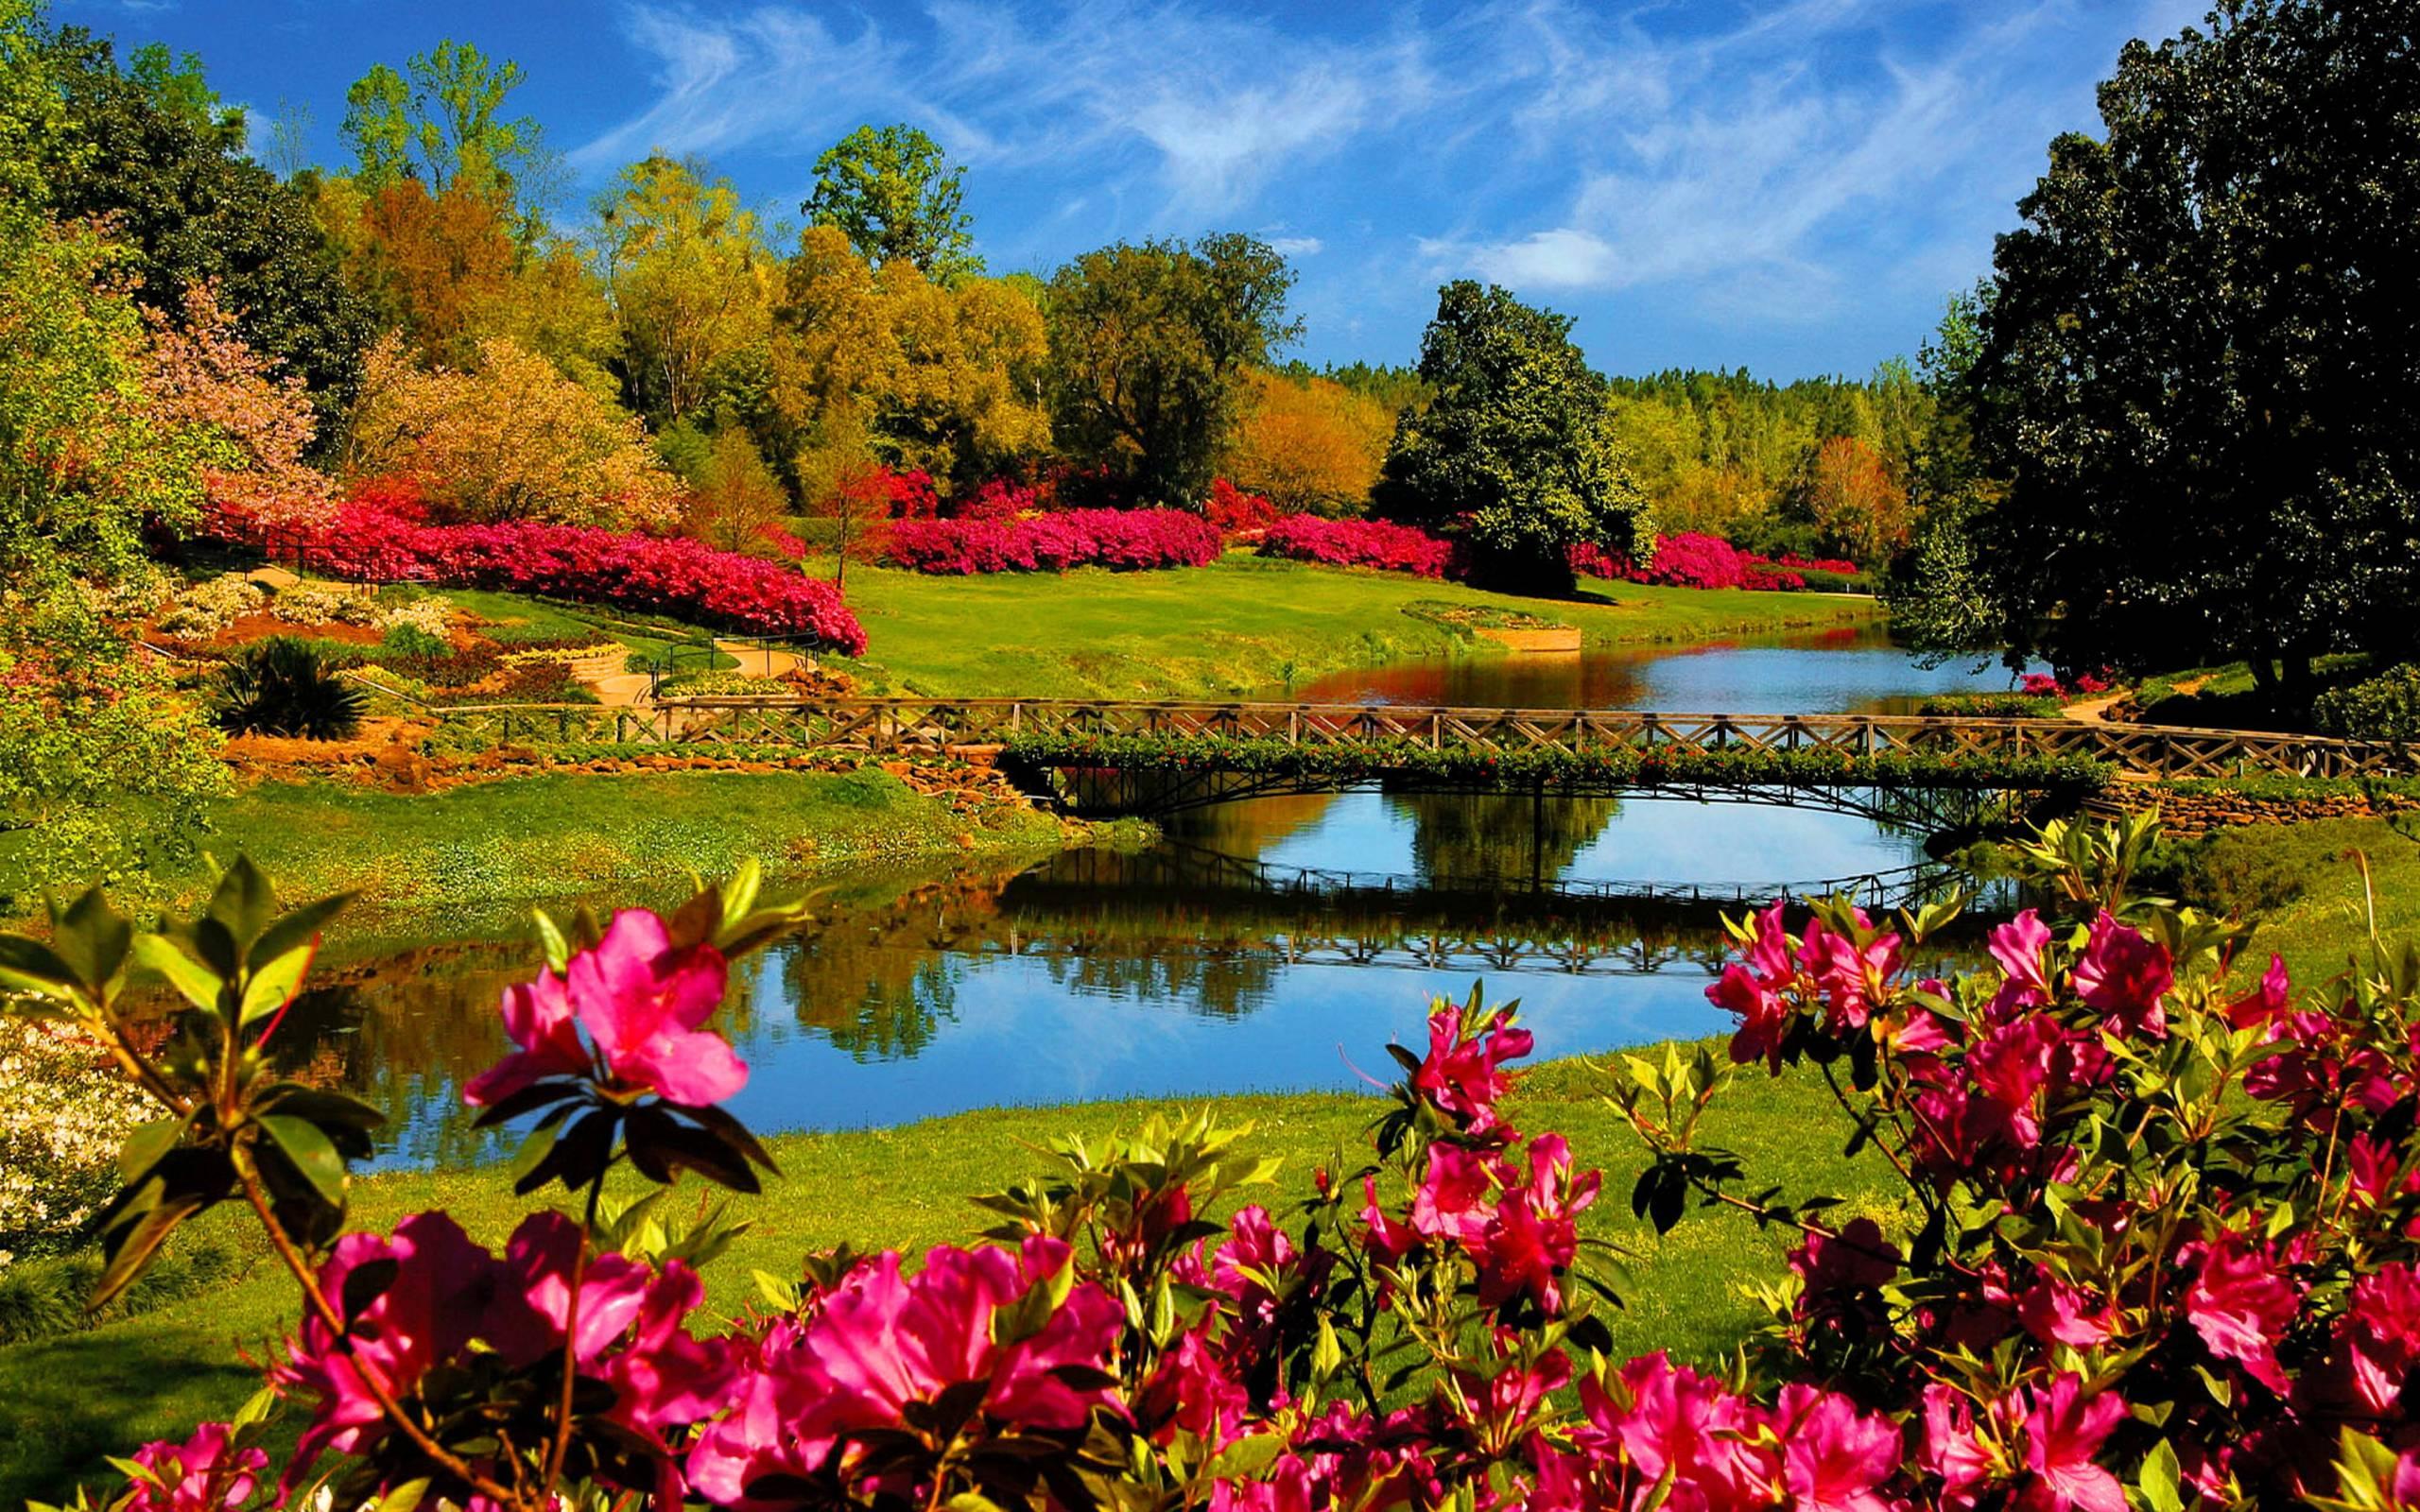 Spring Scenes Desktop Wallpapers   HD Wallpapers Backgrounds of Your 2560x1600